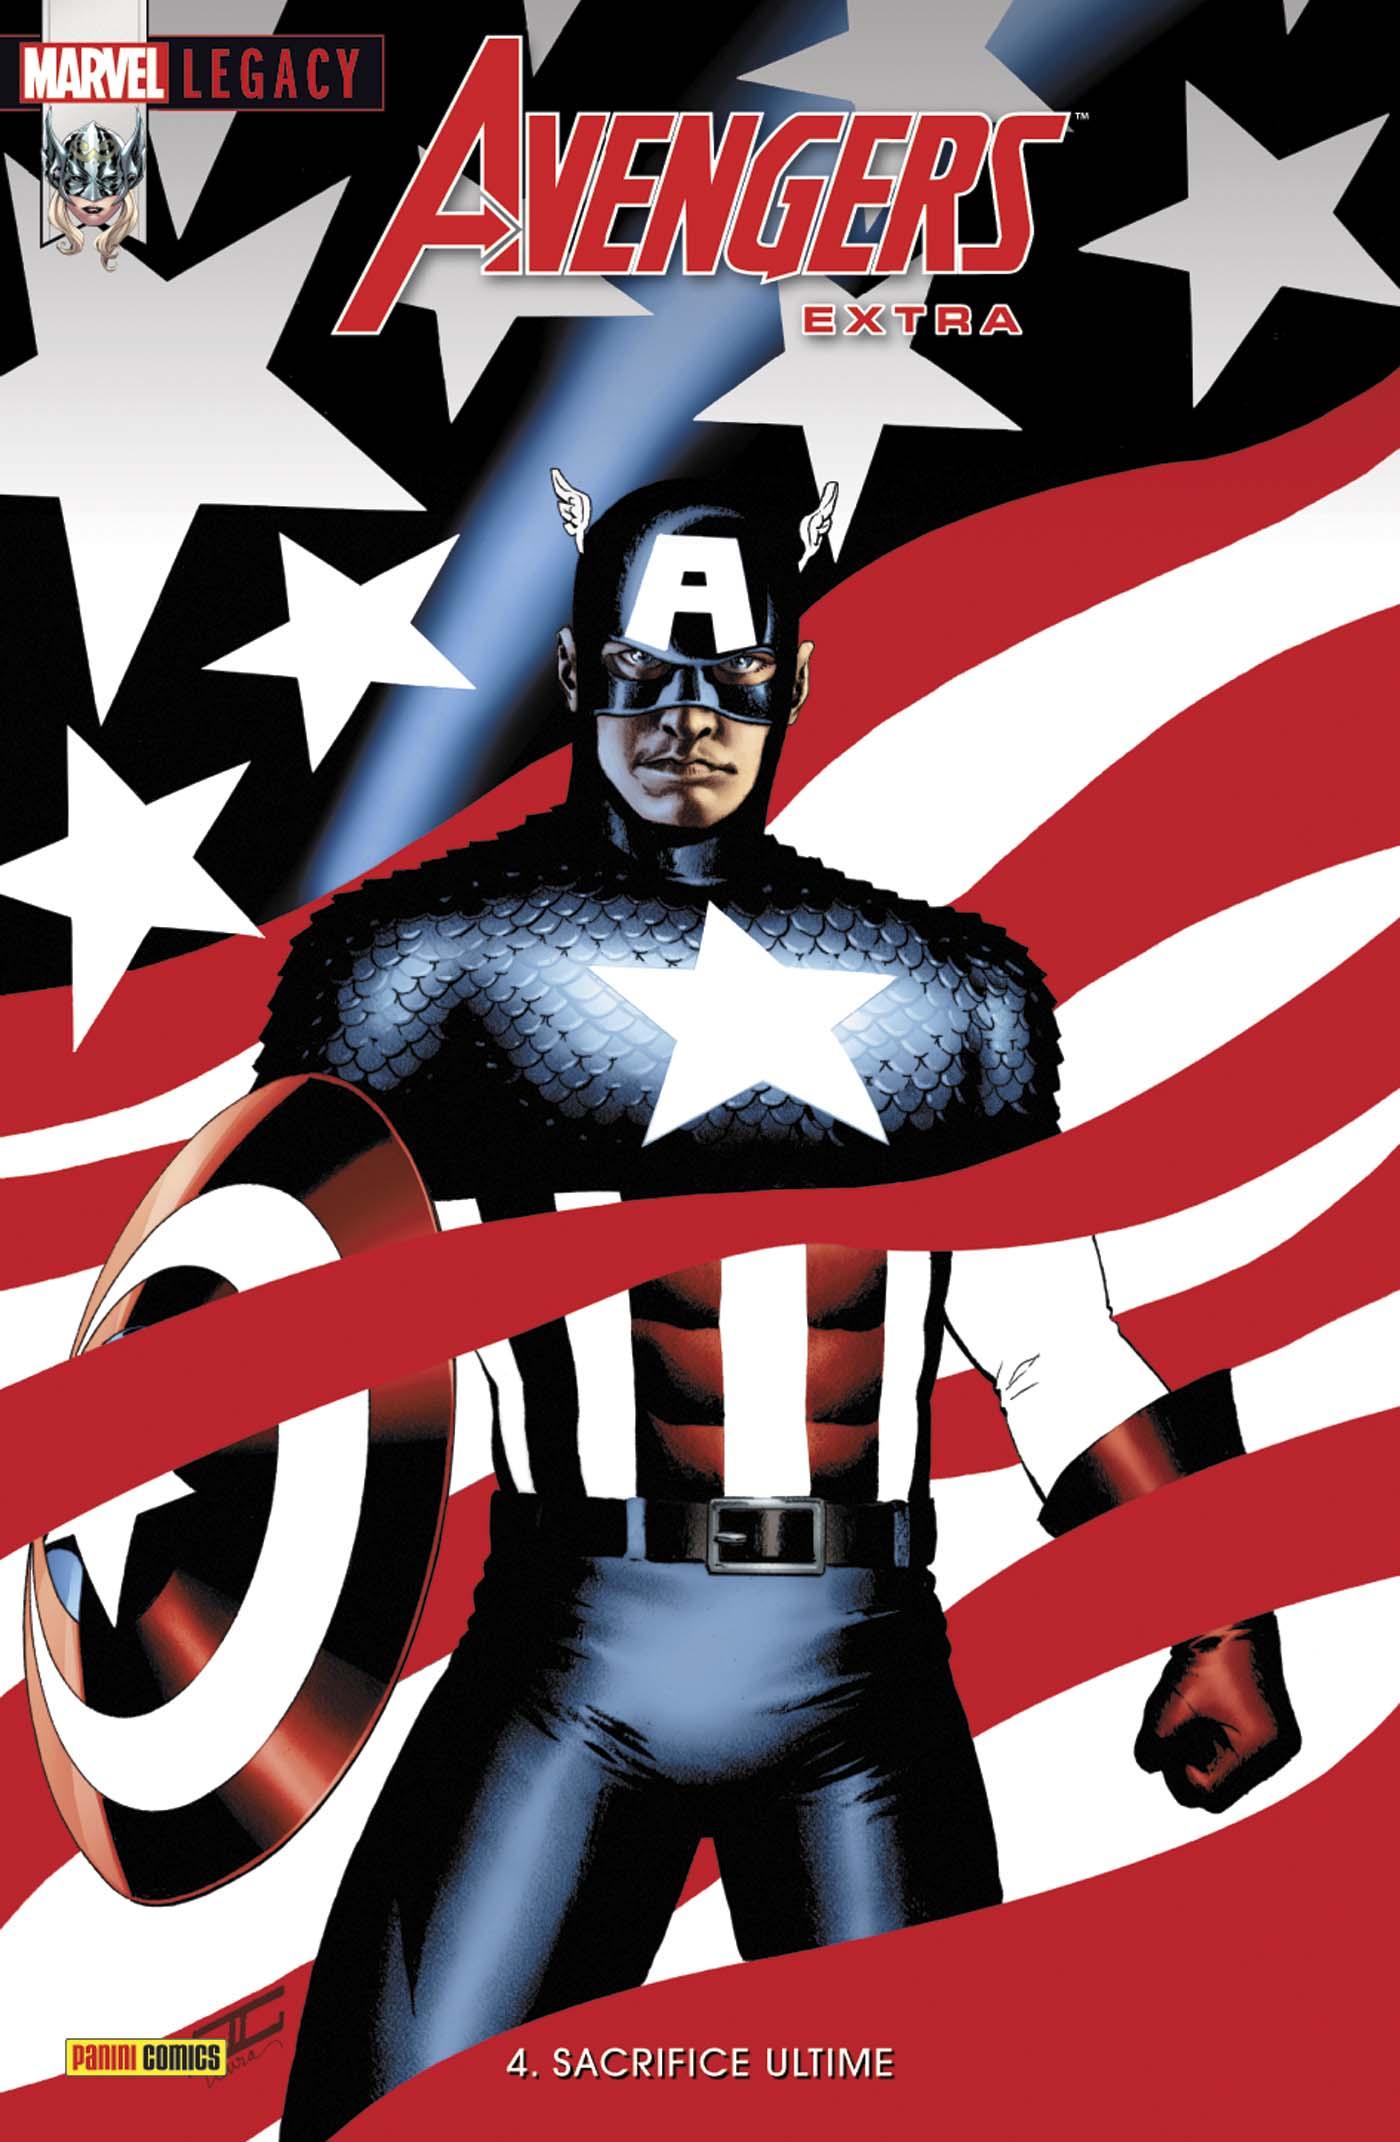 Marvel Legacy - Avengers Extra 4